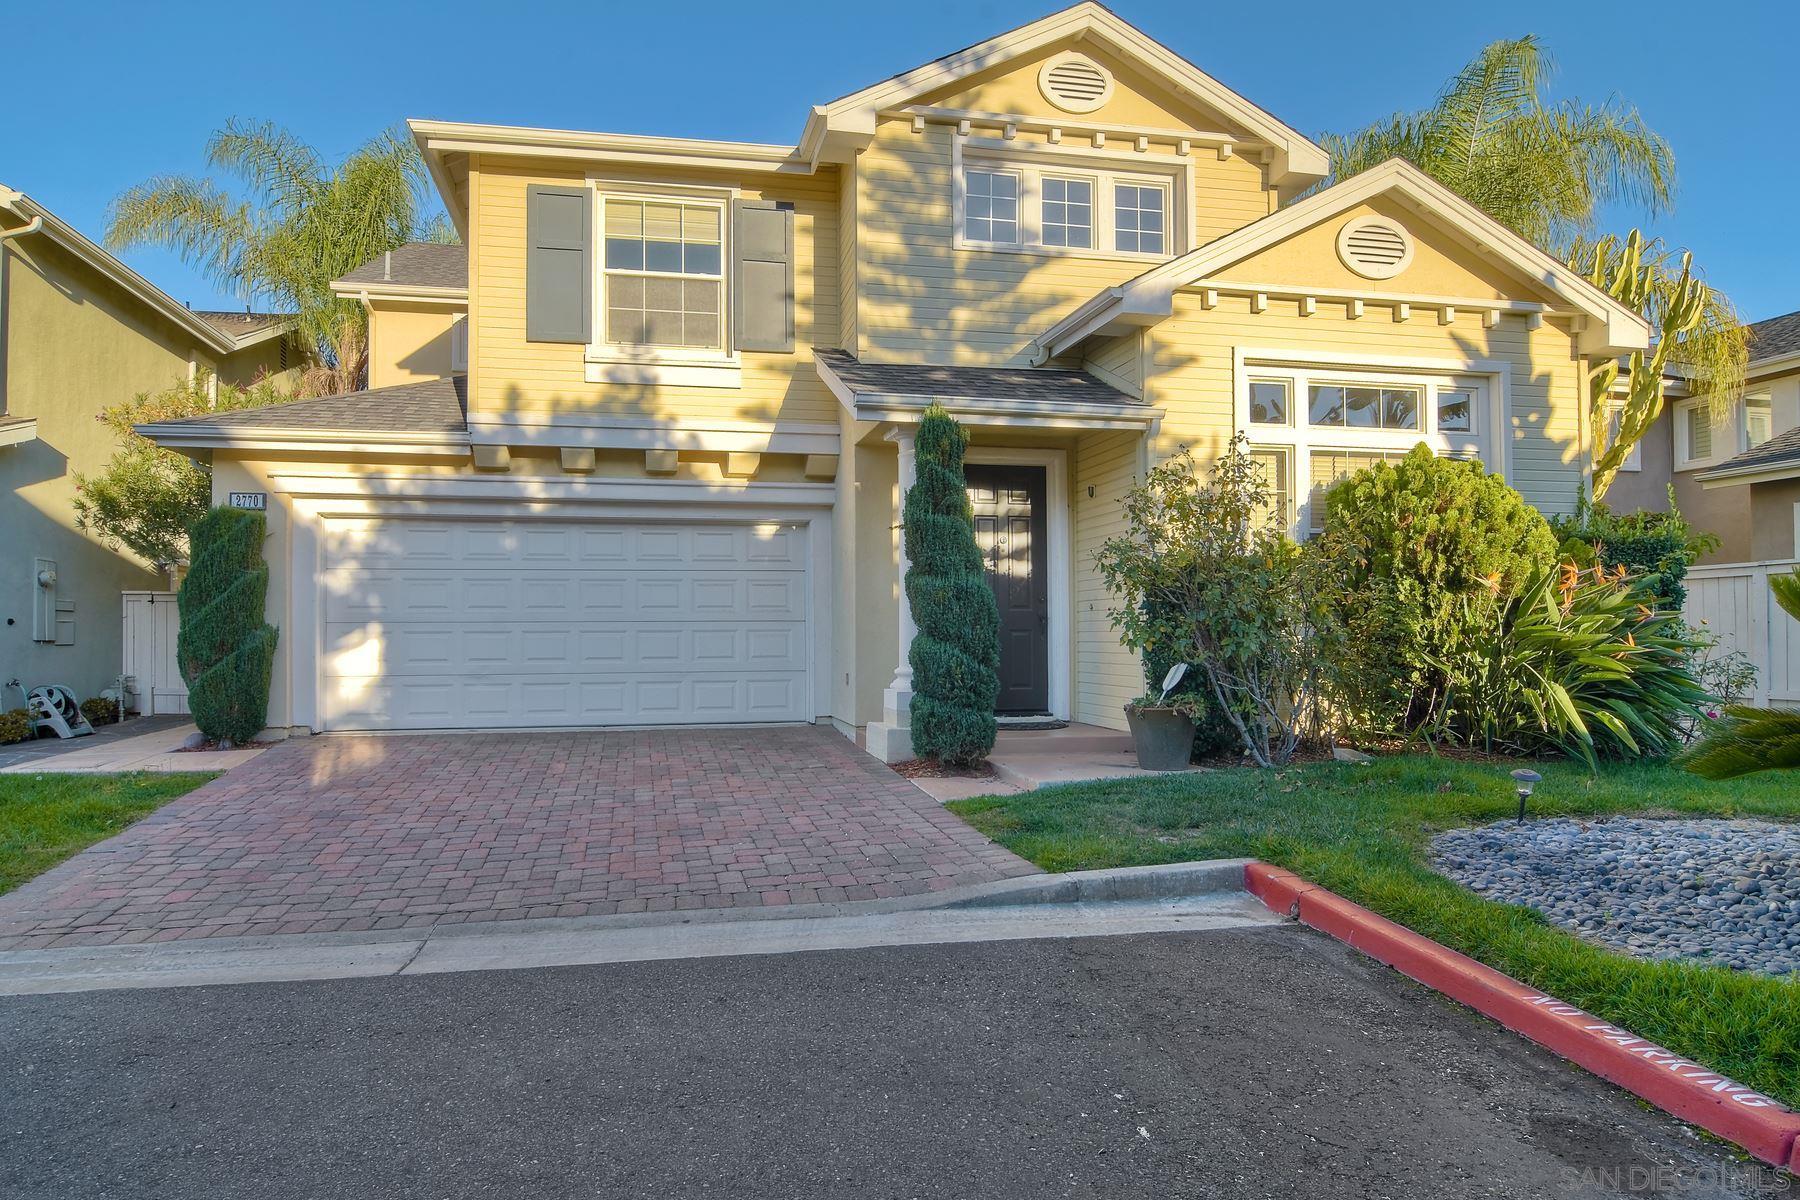 2770 West Canyon Avenue, San Diego, CA 92123